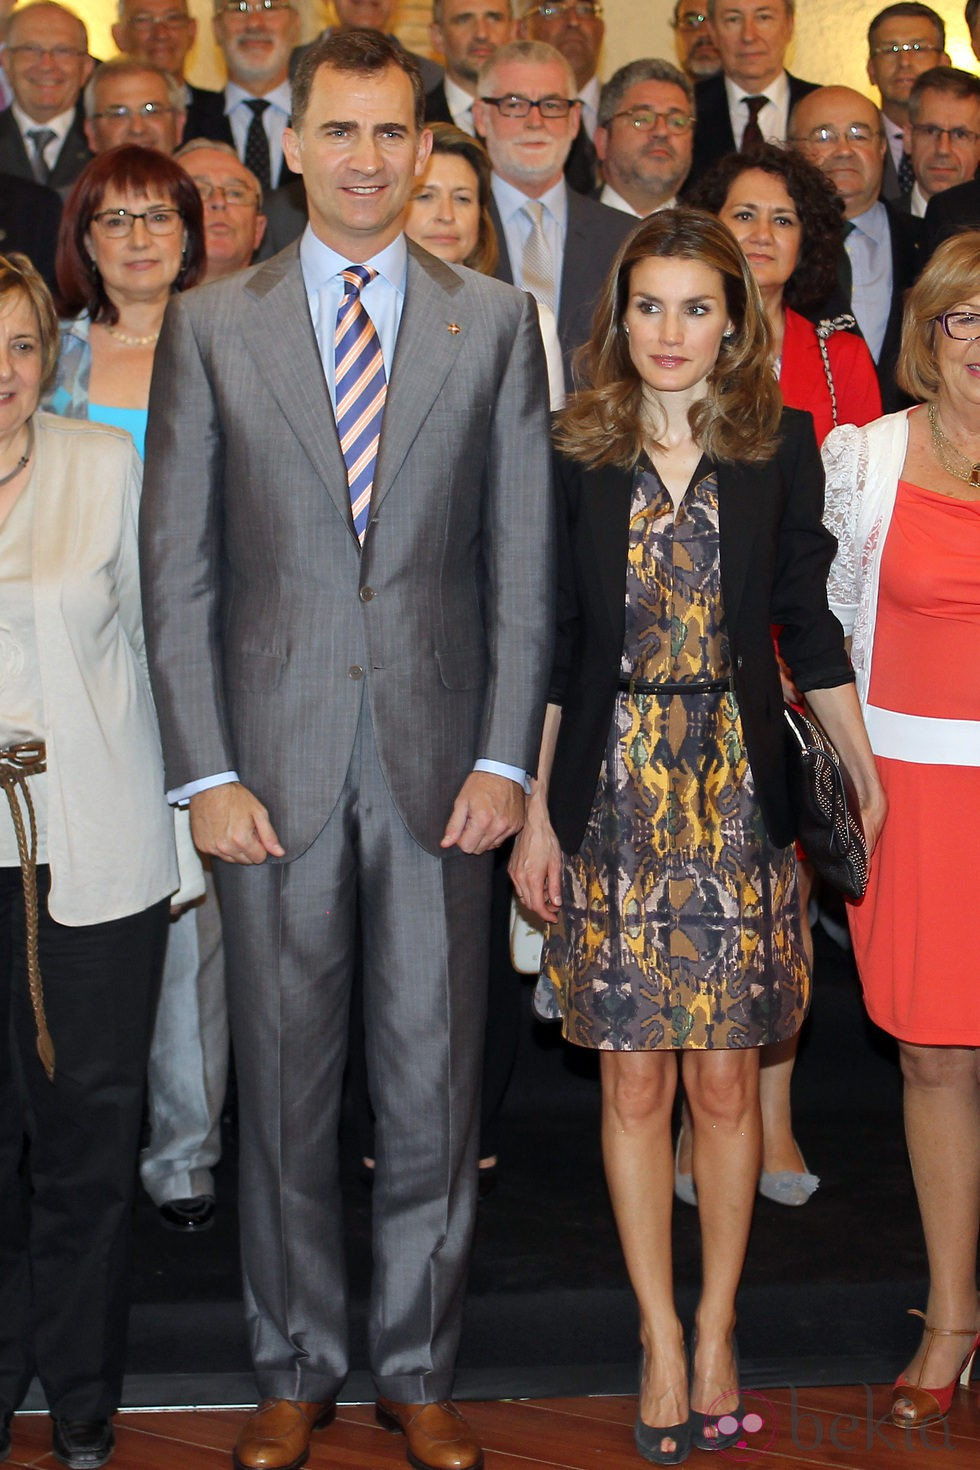 Príncipes de Asturias: visita de 2 días a Girona 24016_principes-asturias-almuerzo-trabajo-girona